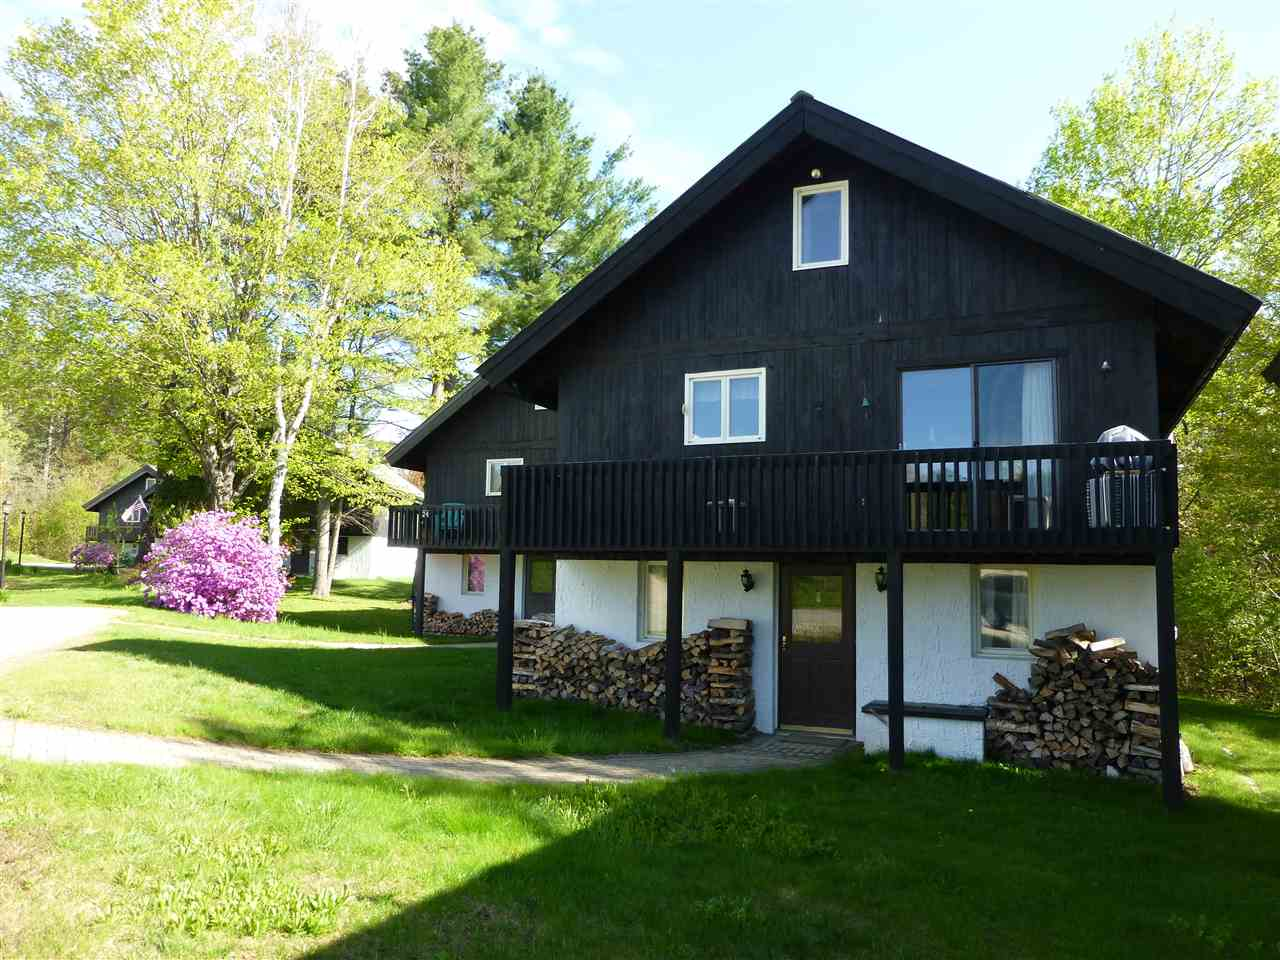 Mount-Snow-Real-Estate-4634315-0